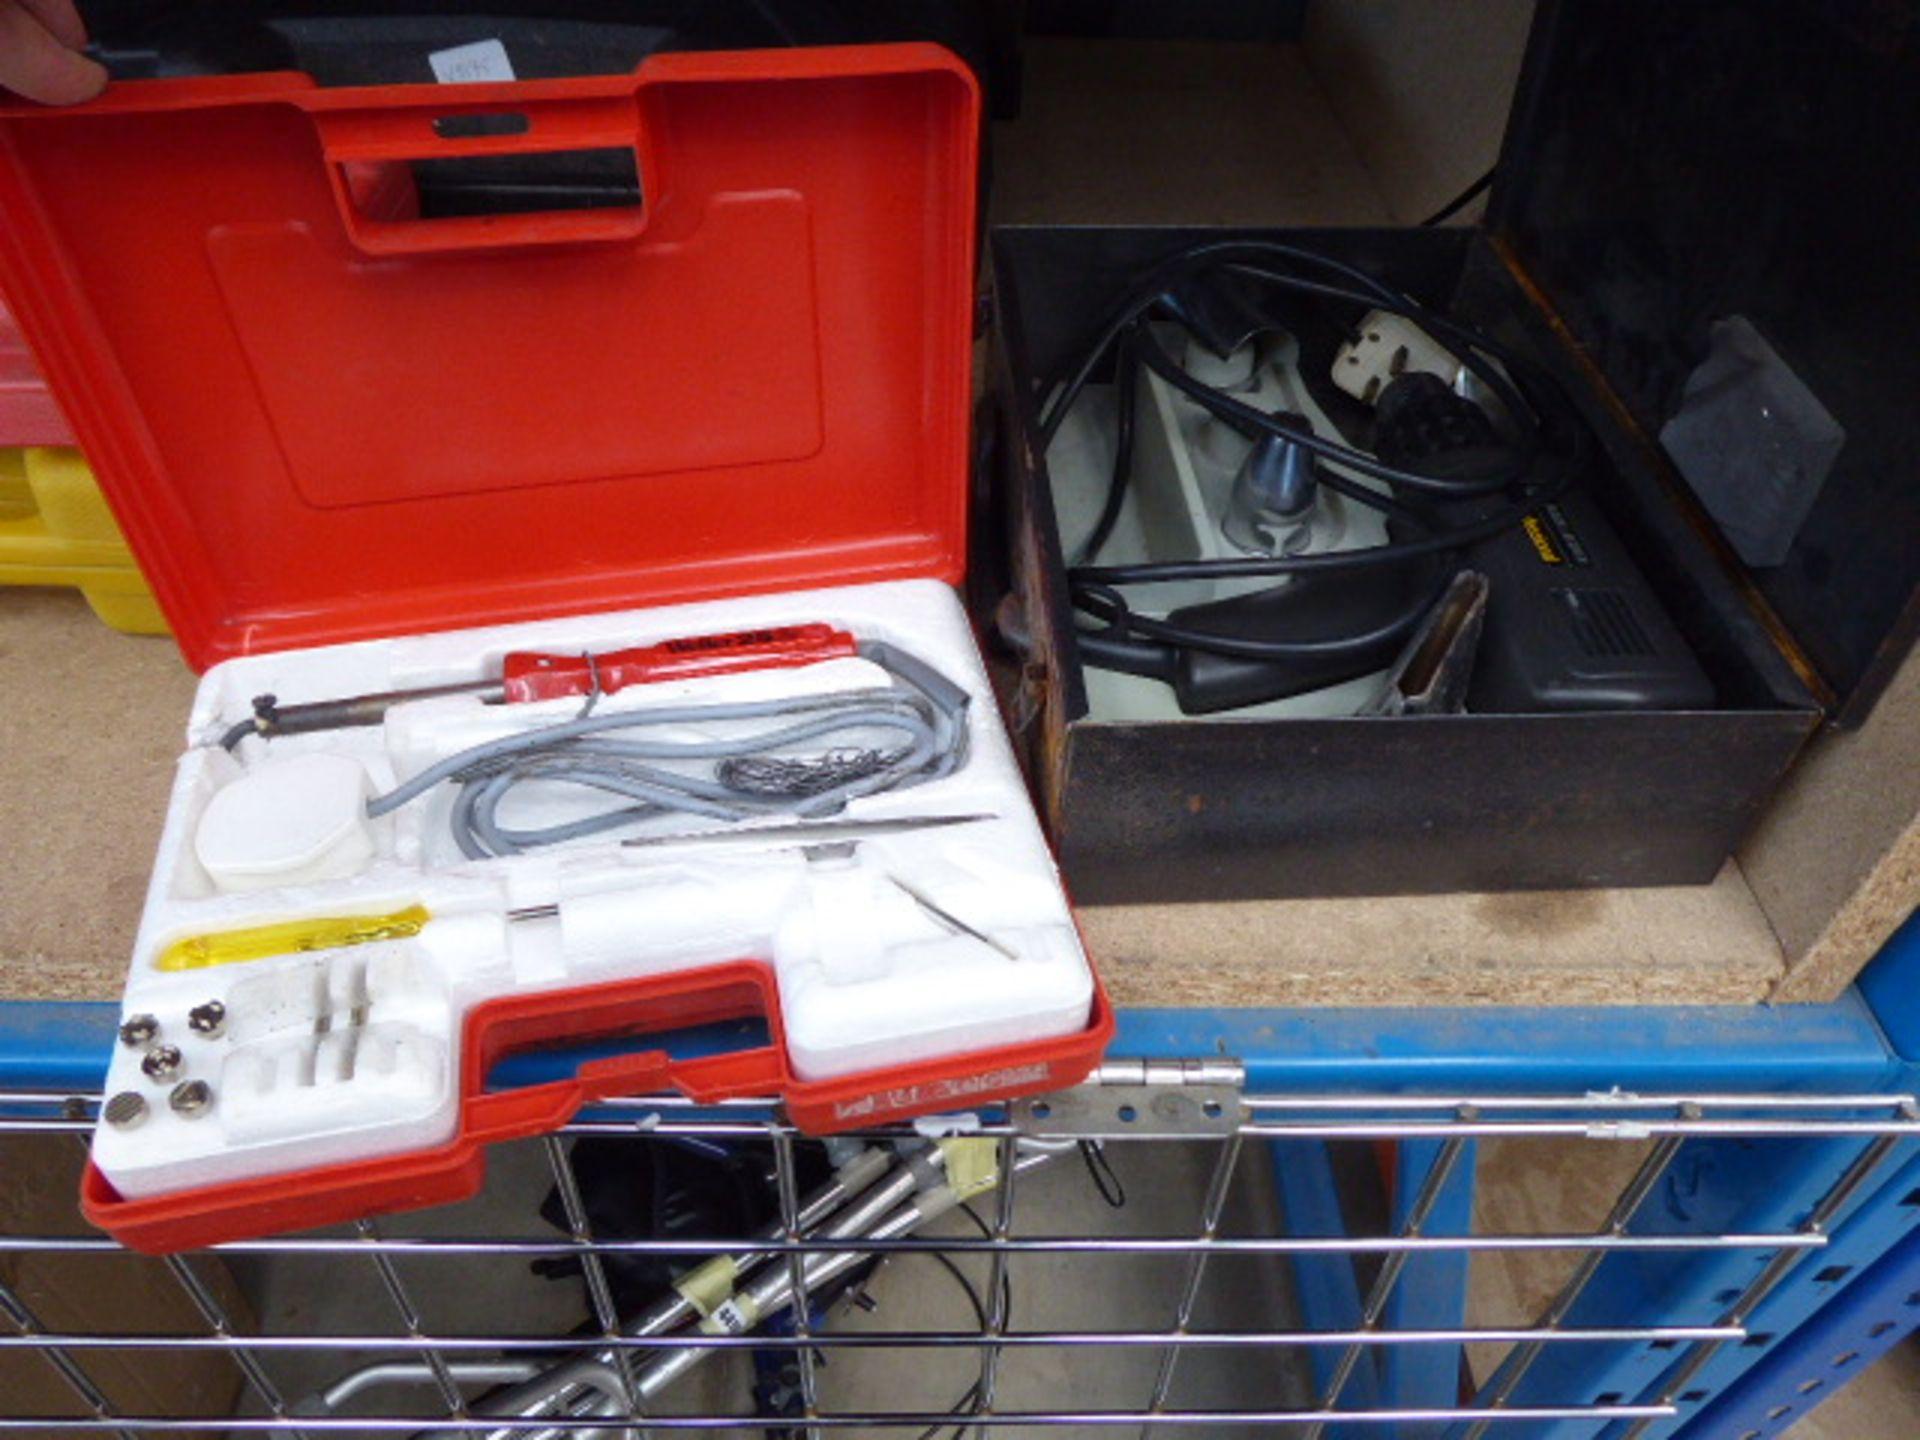 Lot 4452 - Soldero Pro kit, Weller soldering iron and hot air gun